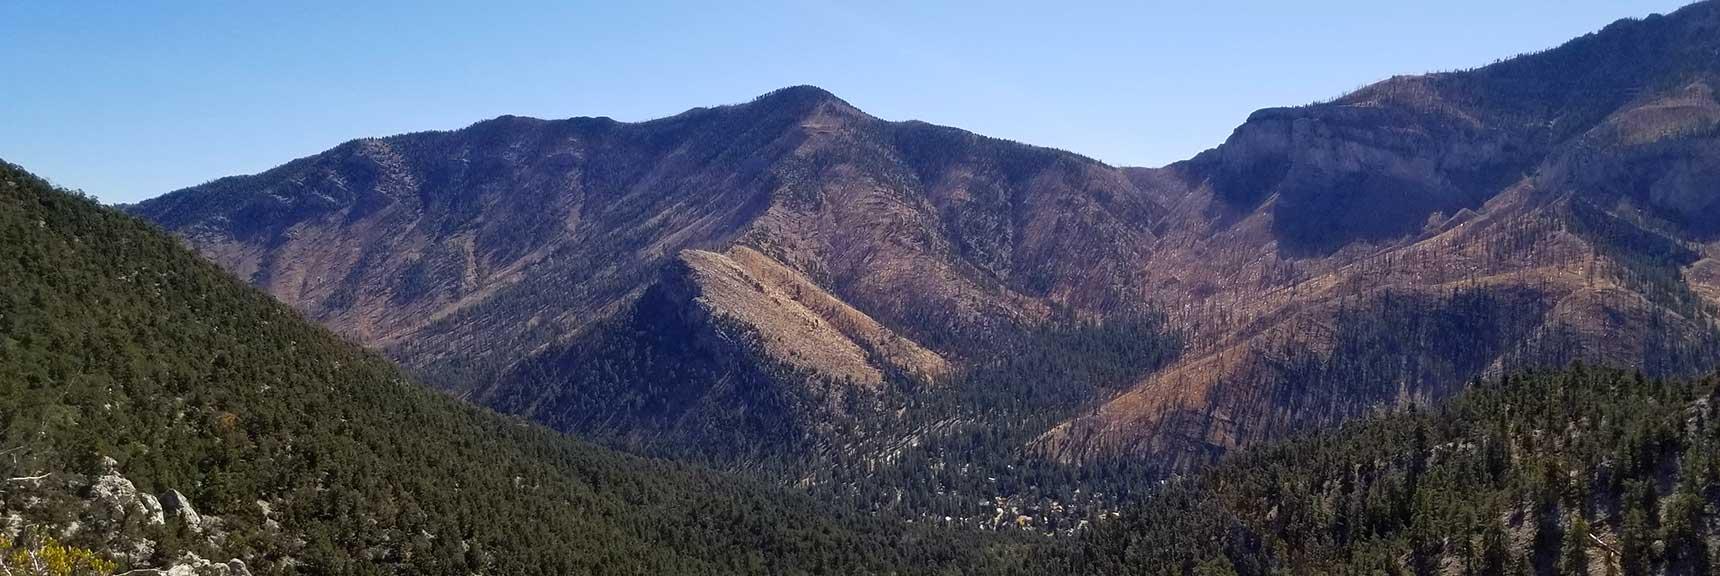 Heading toward Harris Mountain as Target Point of Reference on a Ridge Below Cockscomb Ridge in Mt. Charleston Wilderness, Nevada